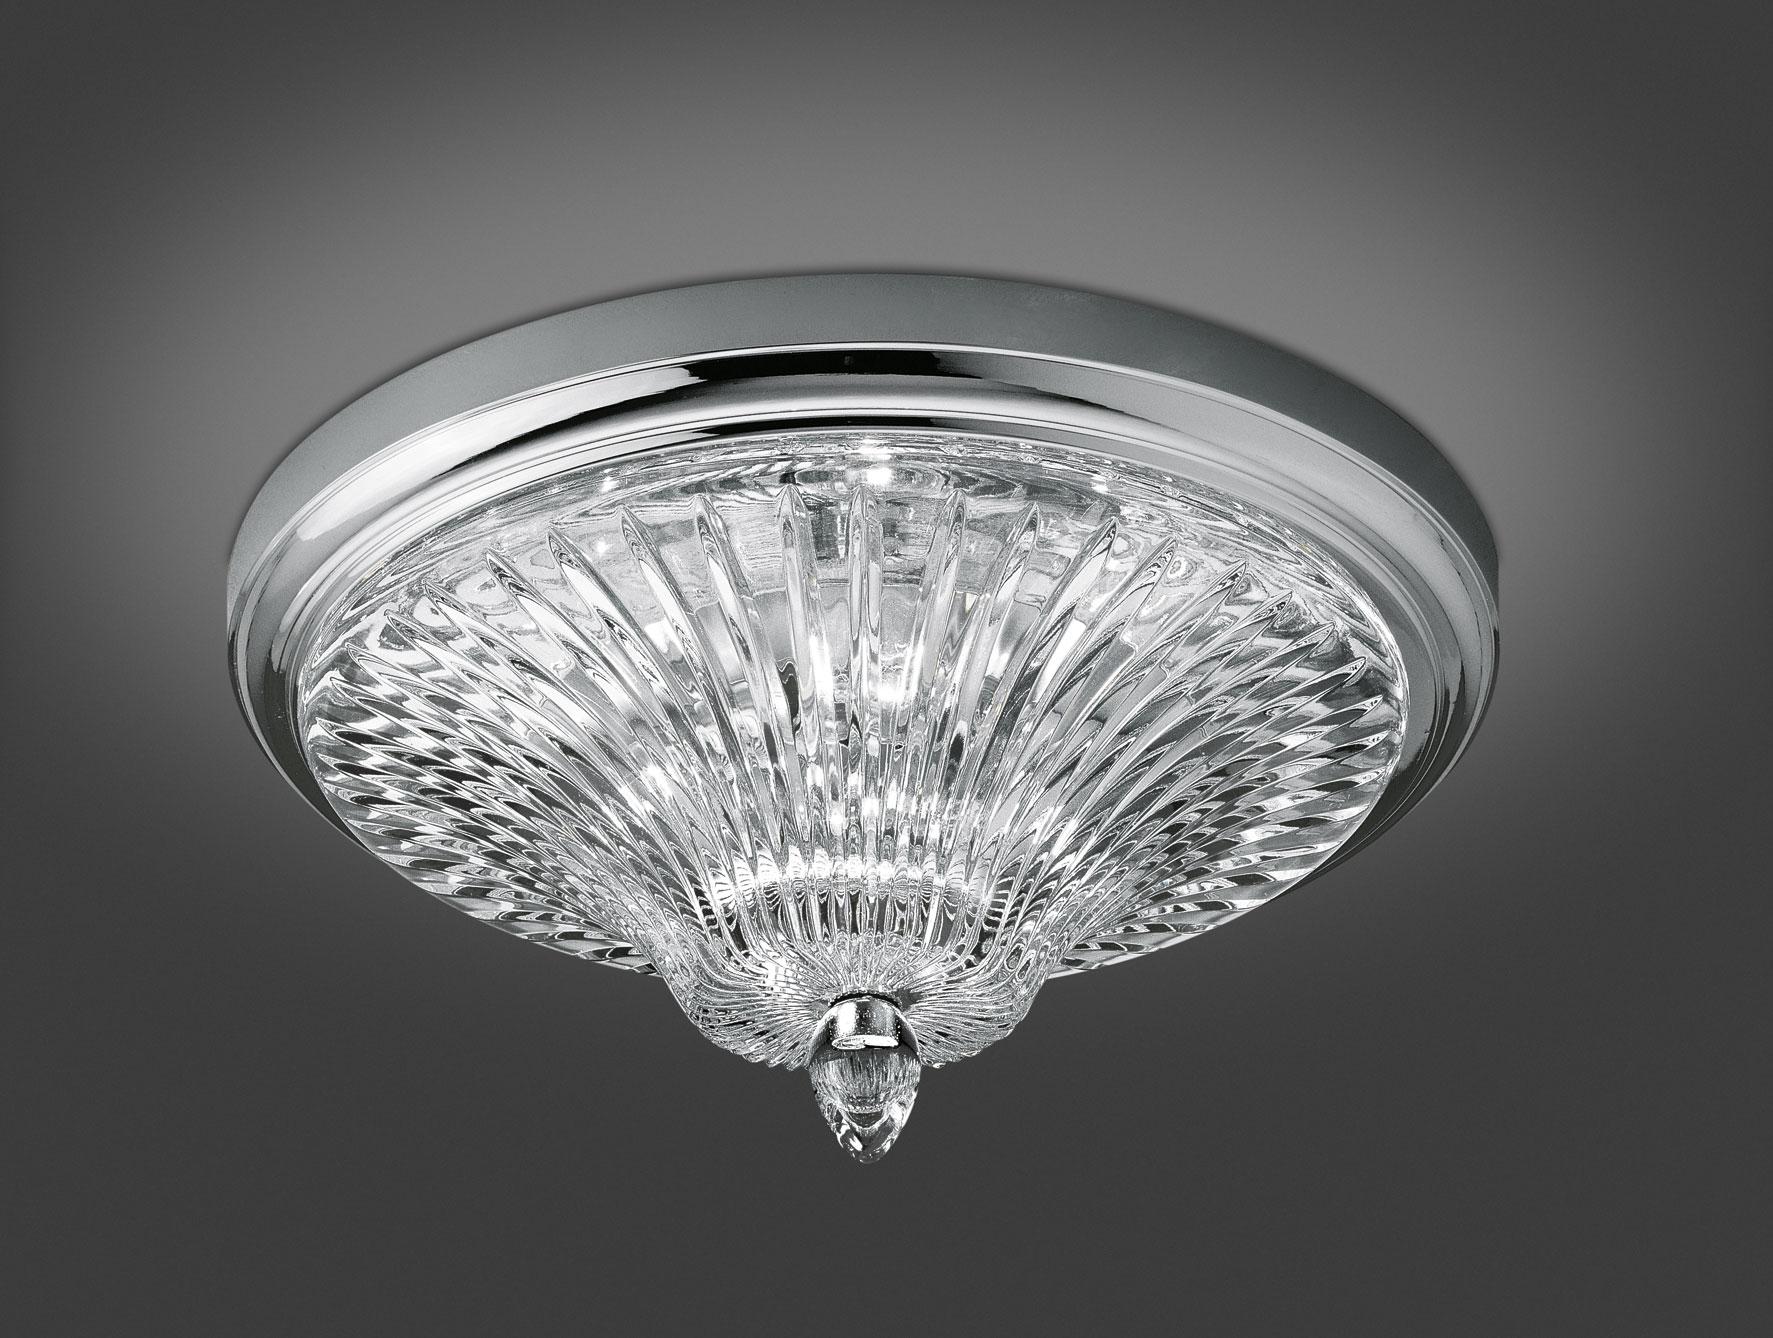 10 Types of Lights ceiling modern